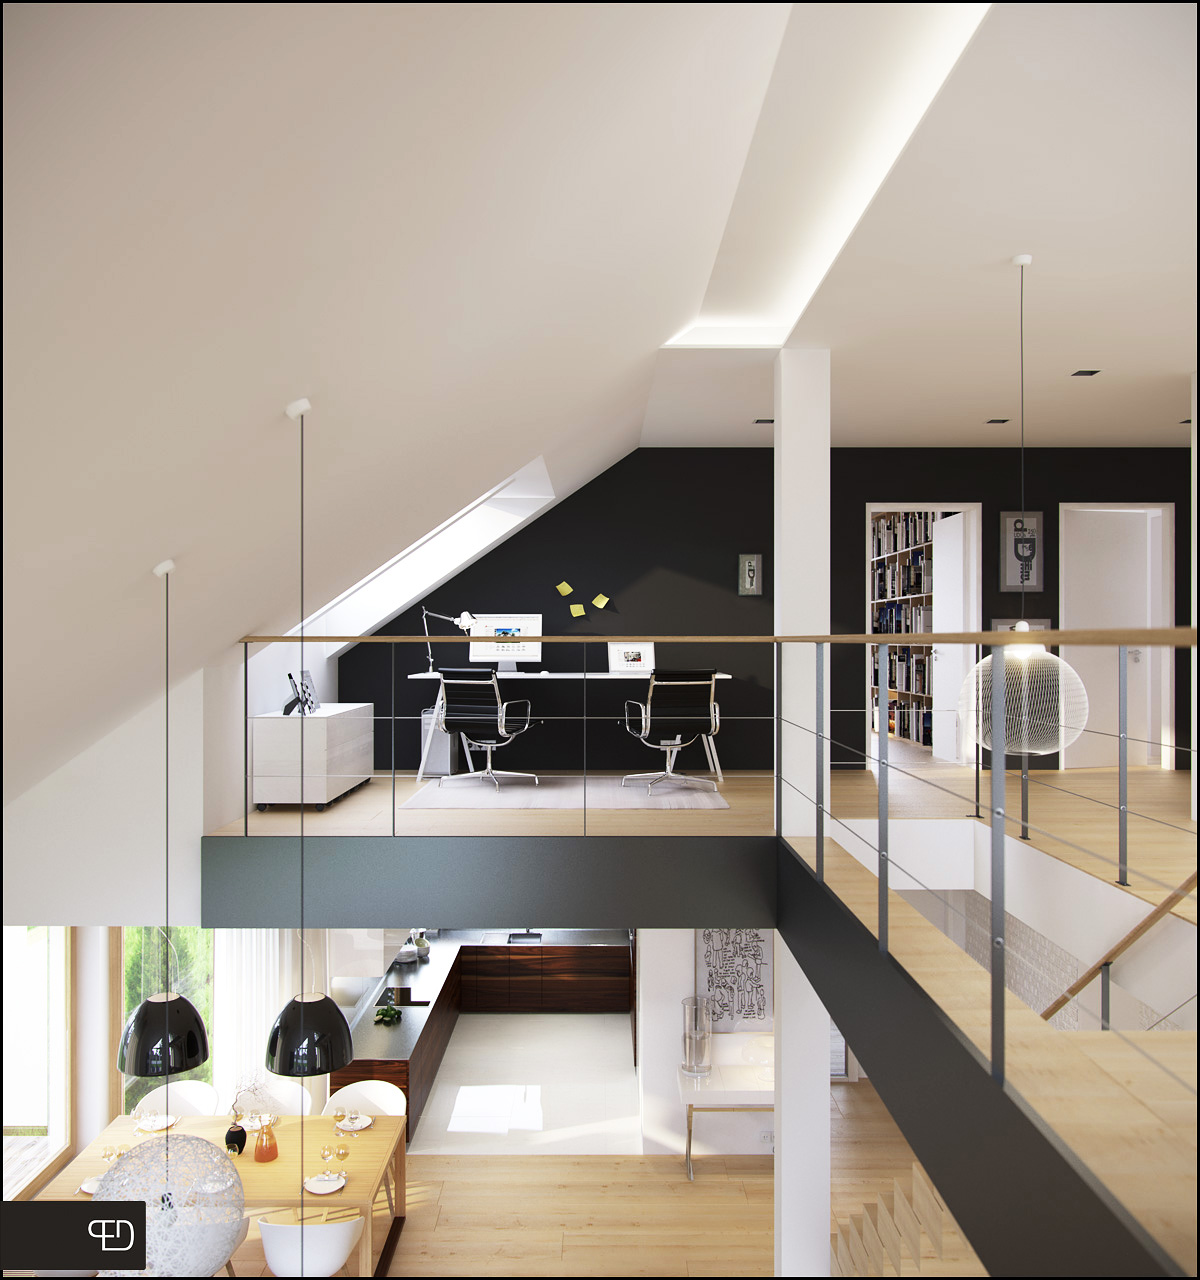 Photo of Inspirational Mezzanine Floor Designs To Elevate Your Interiors   Loft style wi